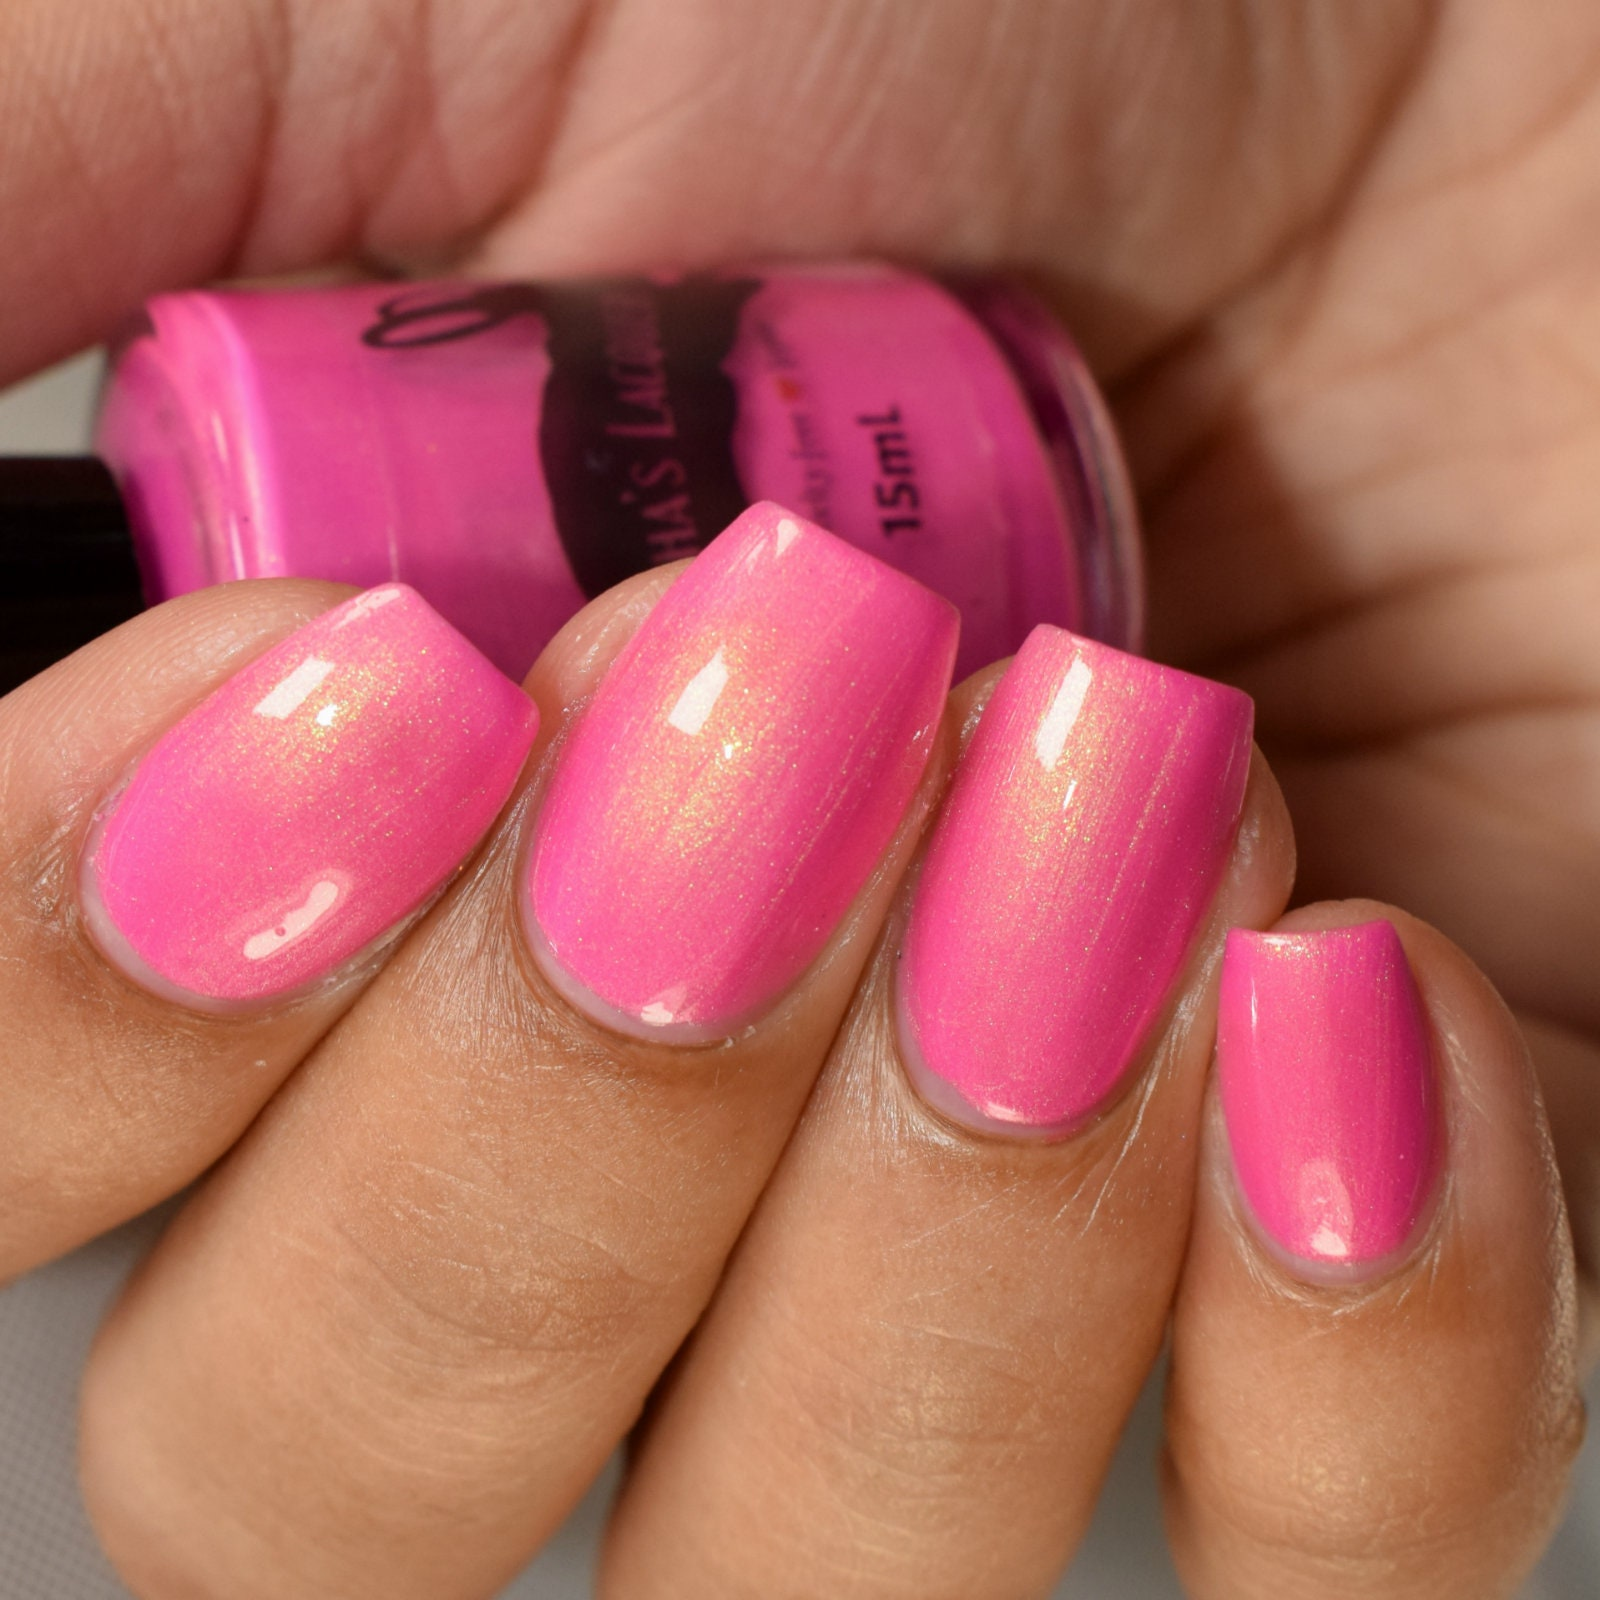 Teeming with Tulips Pink Indie Nail Polish Shimmer Nail | Etsy